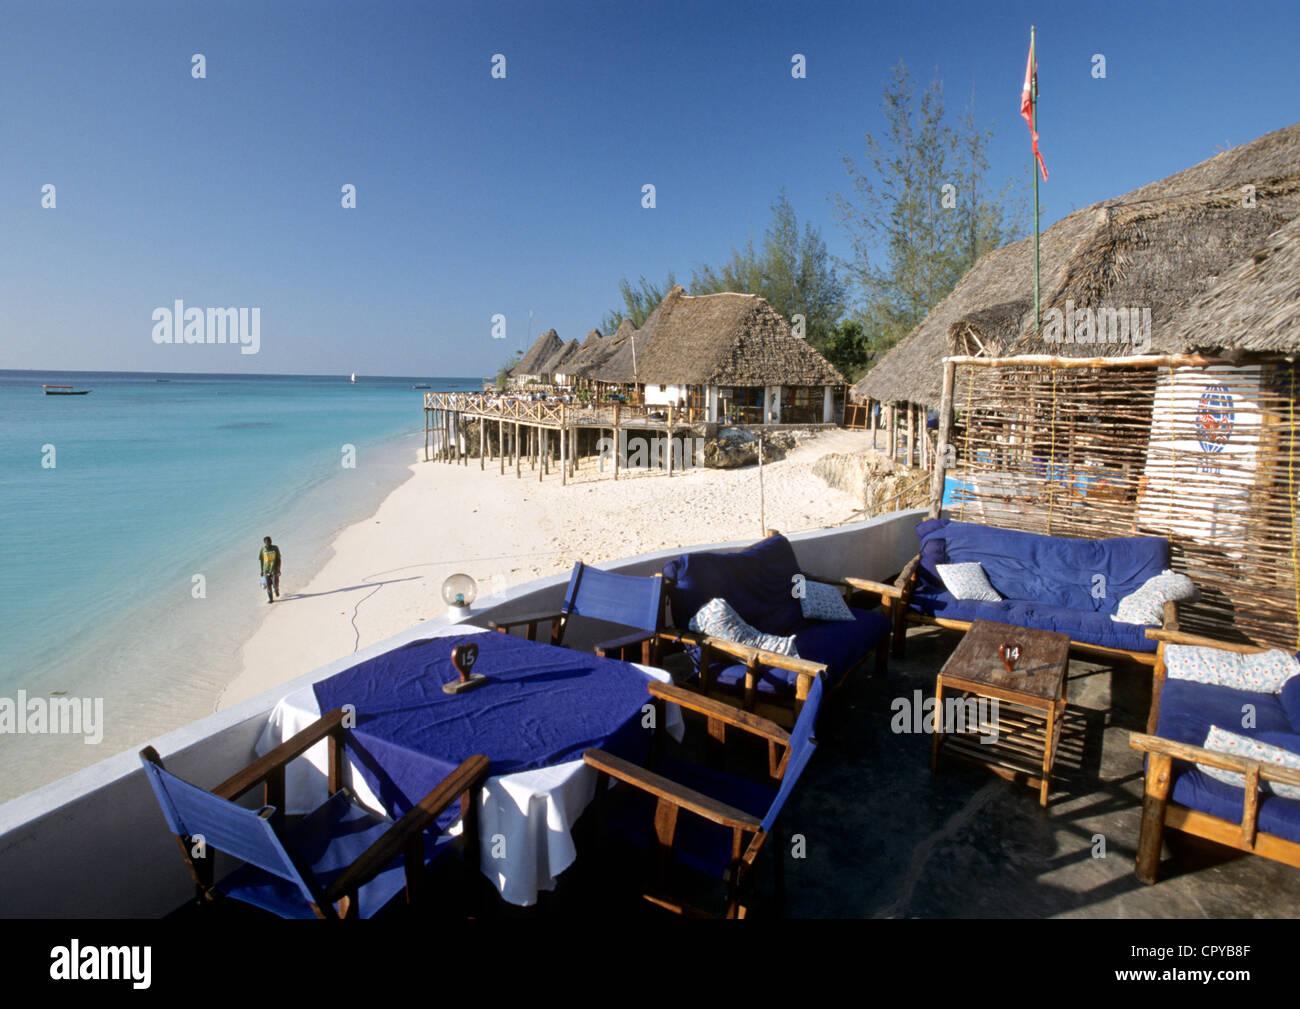 Tanzania, Zanzibar Archipelago, Unguja island (Zanzibar), Nungwi, cafe terrace on the beach - Stock Image